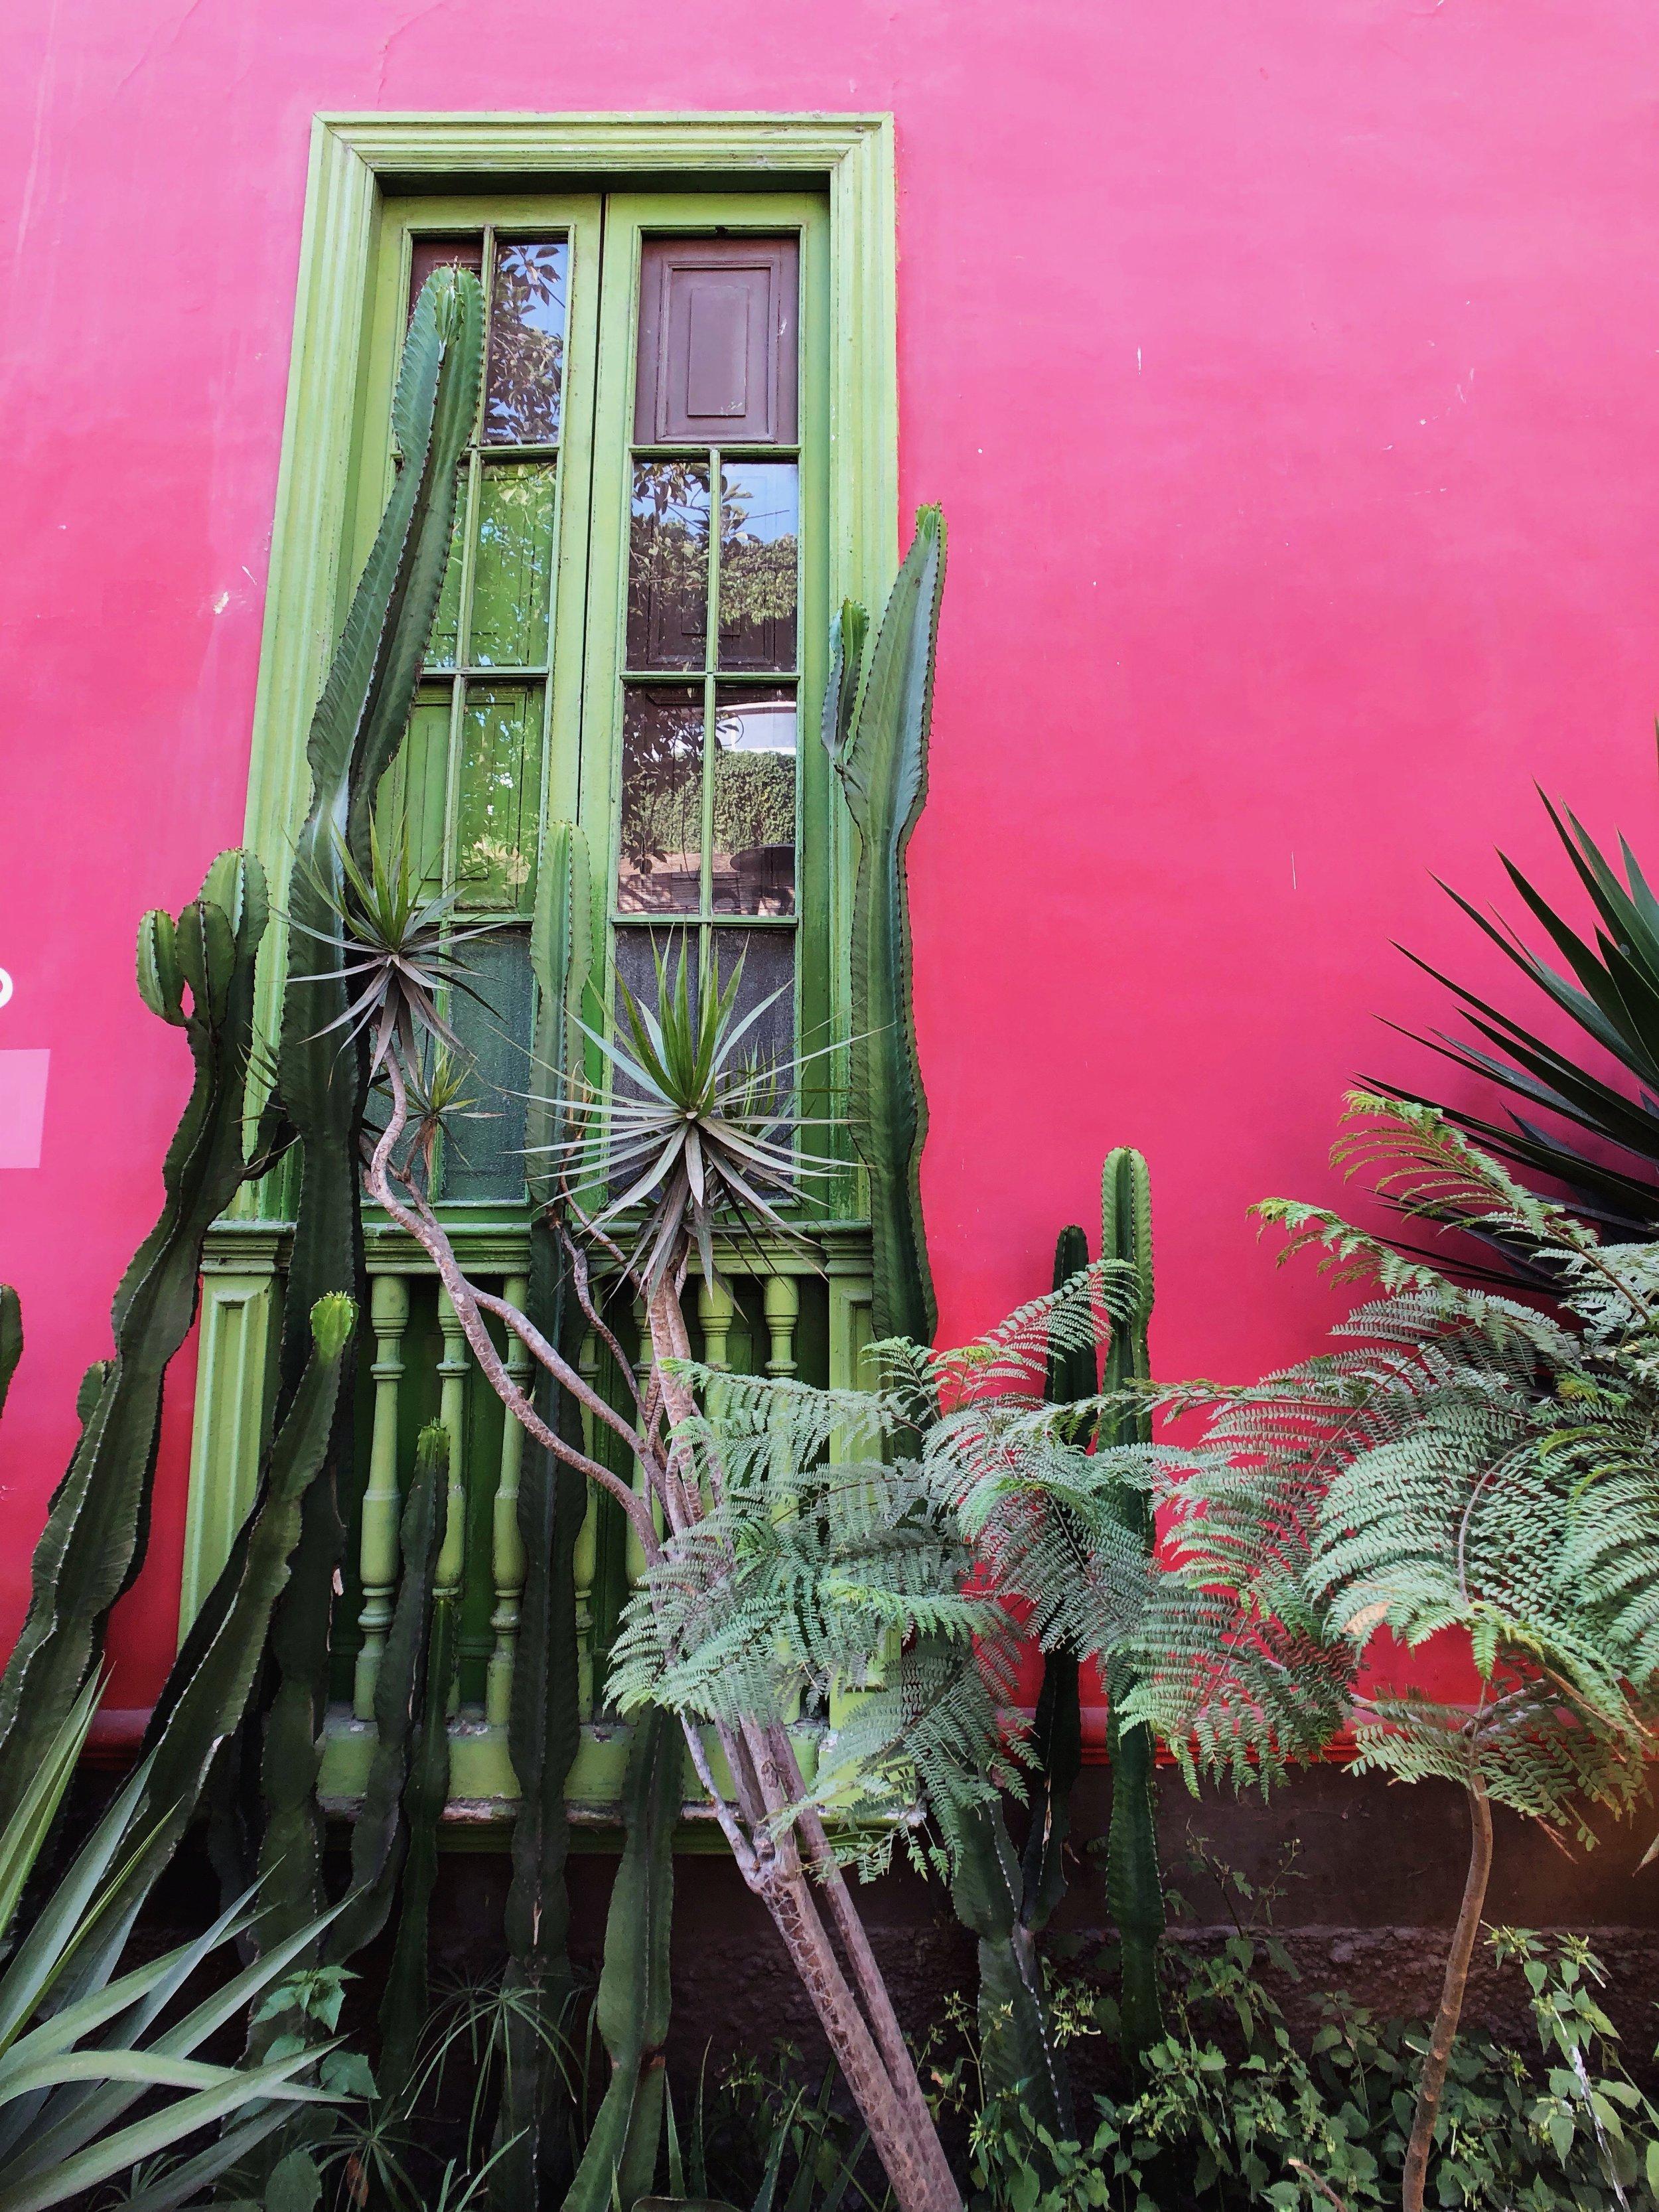 barranco-south america-lima-peru-bridge of sighs-travel tips-cactus